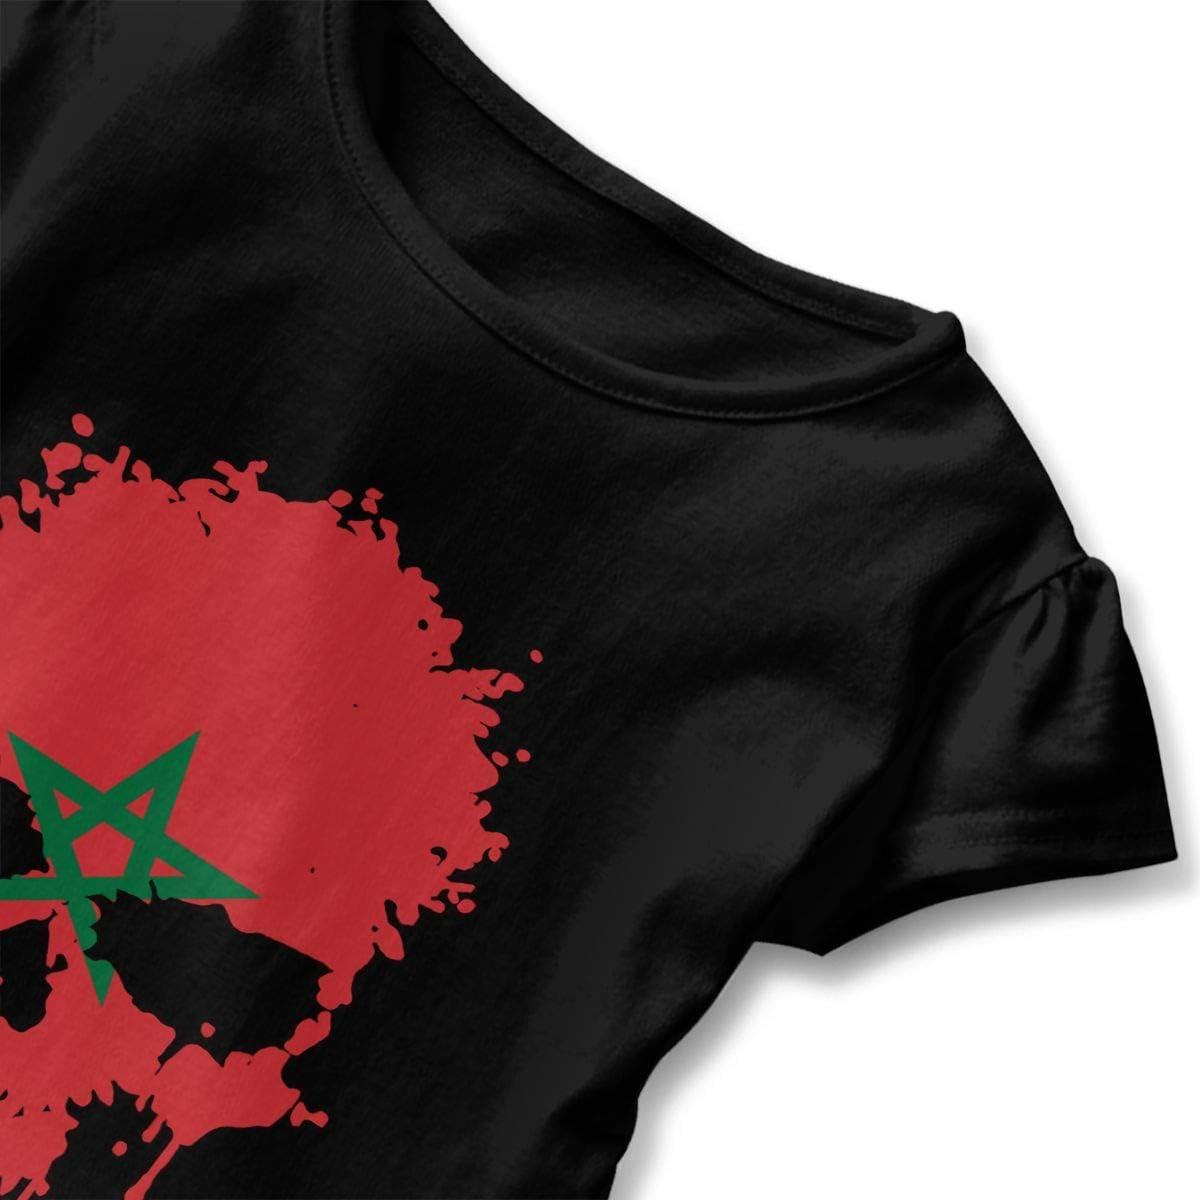 2-6T Kawaii Tunic Shirt Dress with Falbala Zi7J9q-0 Short-Sleeve Morocco Skull T-Shirts for Children